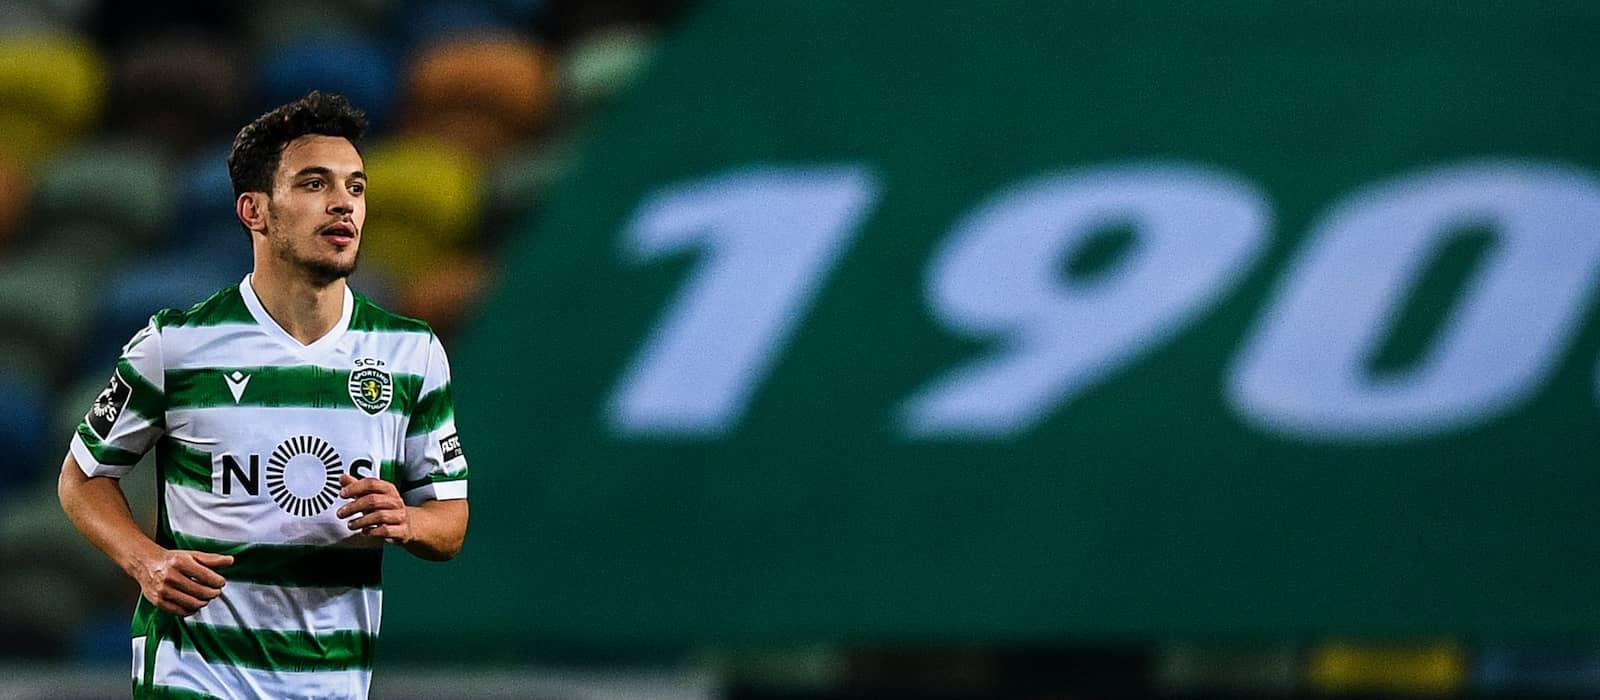 Man United make informal enquiry about Sporting Lisbon's Pedro Goncalves